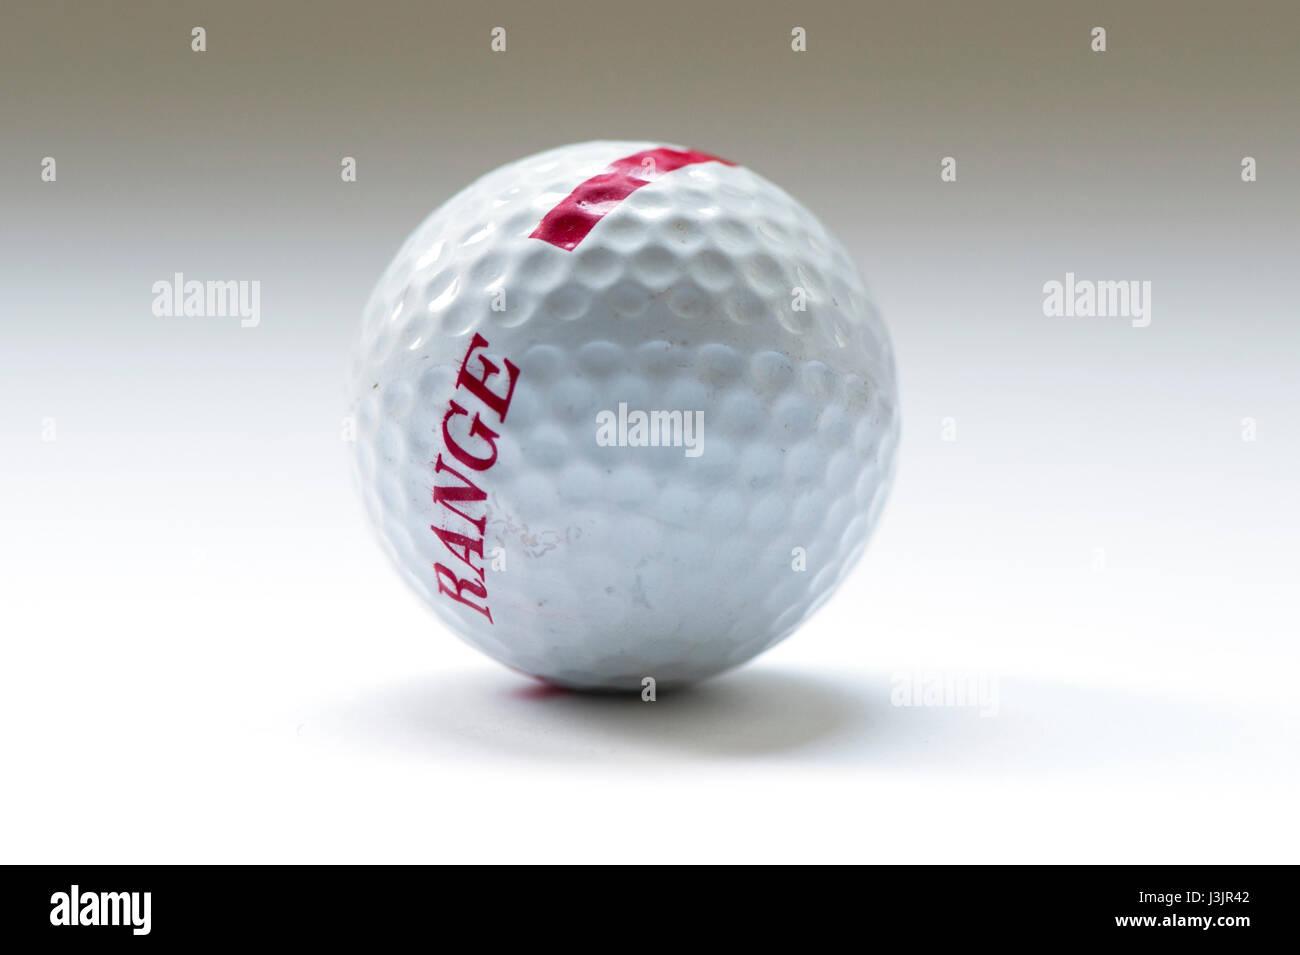 one golf ball - Stock Image